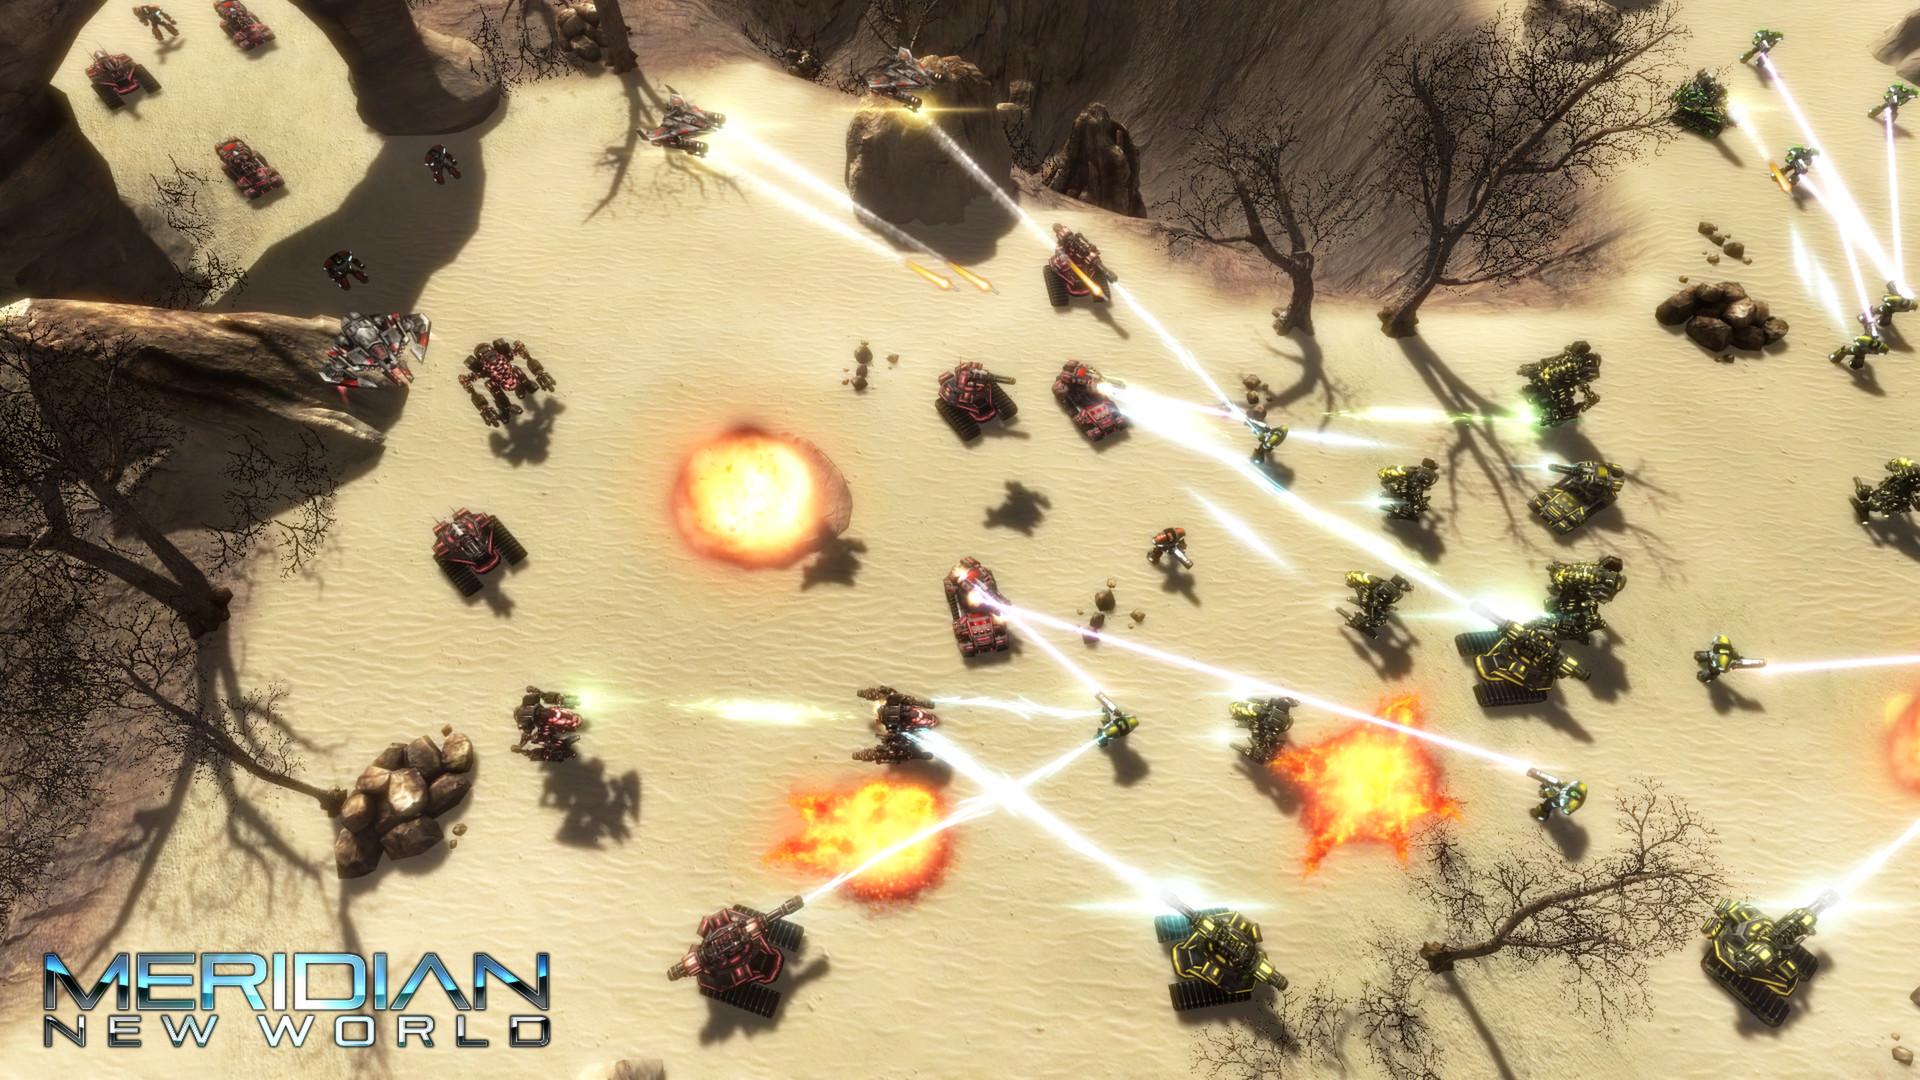 Meridian: New World screenshot 3